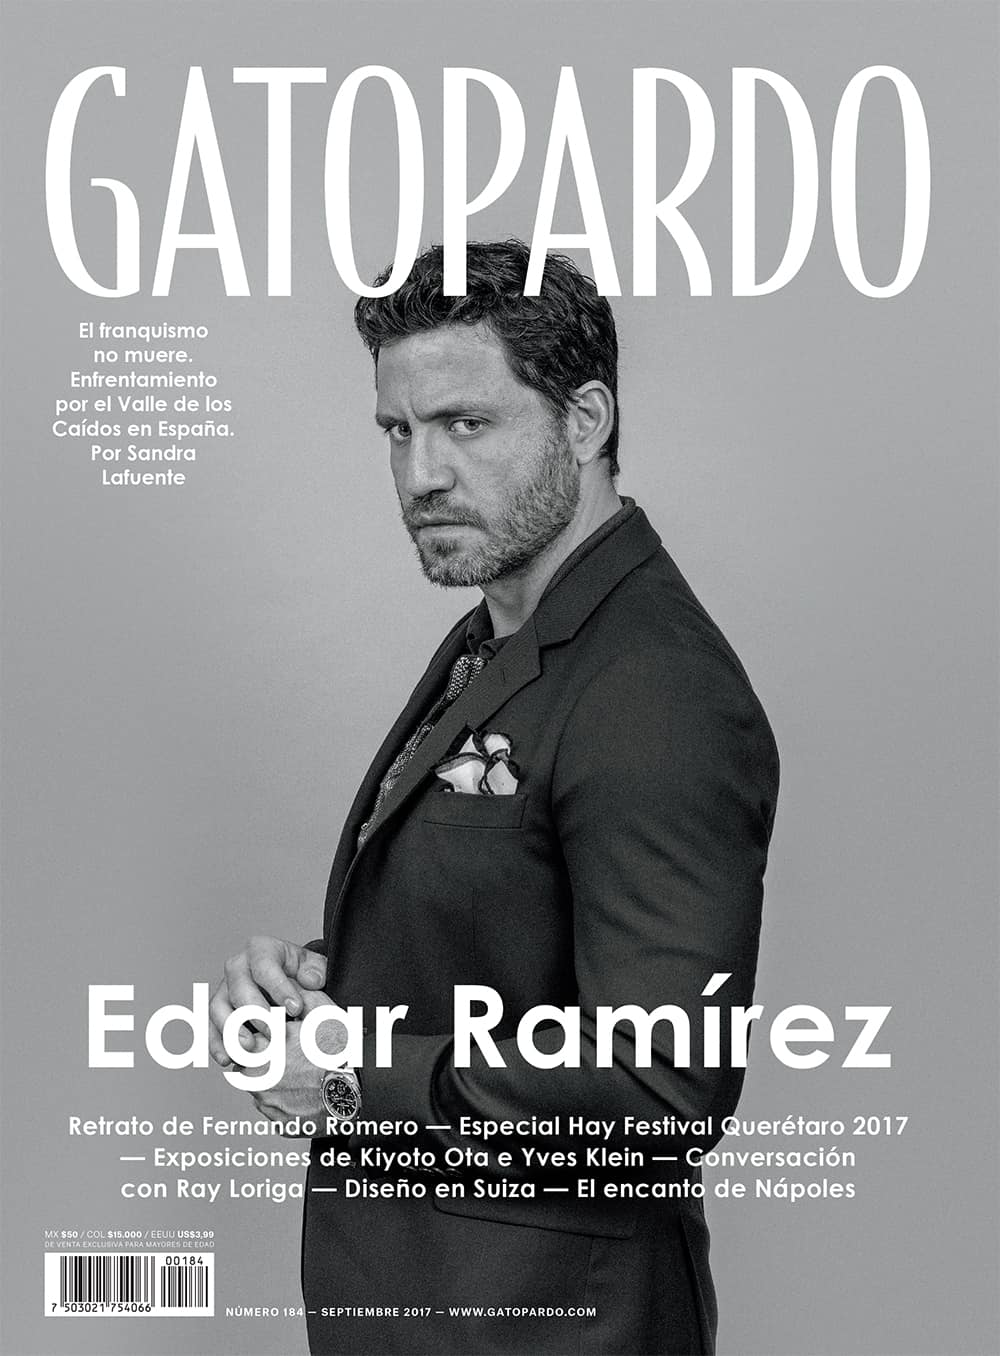 Edgar Ramírez Venezuela, int